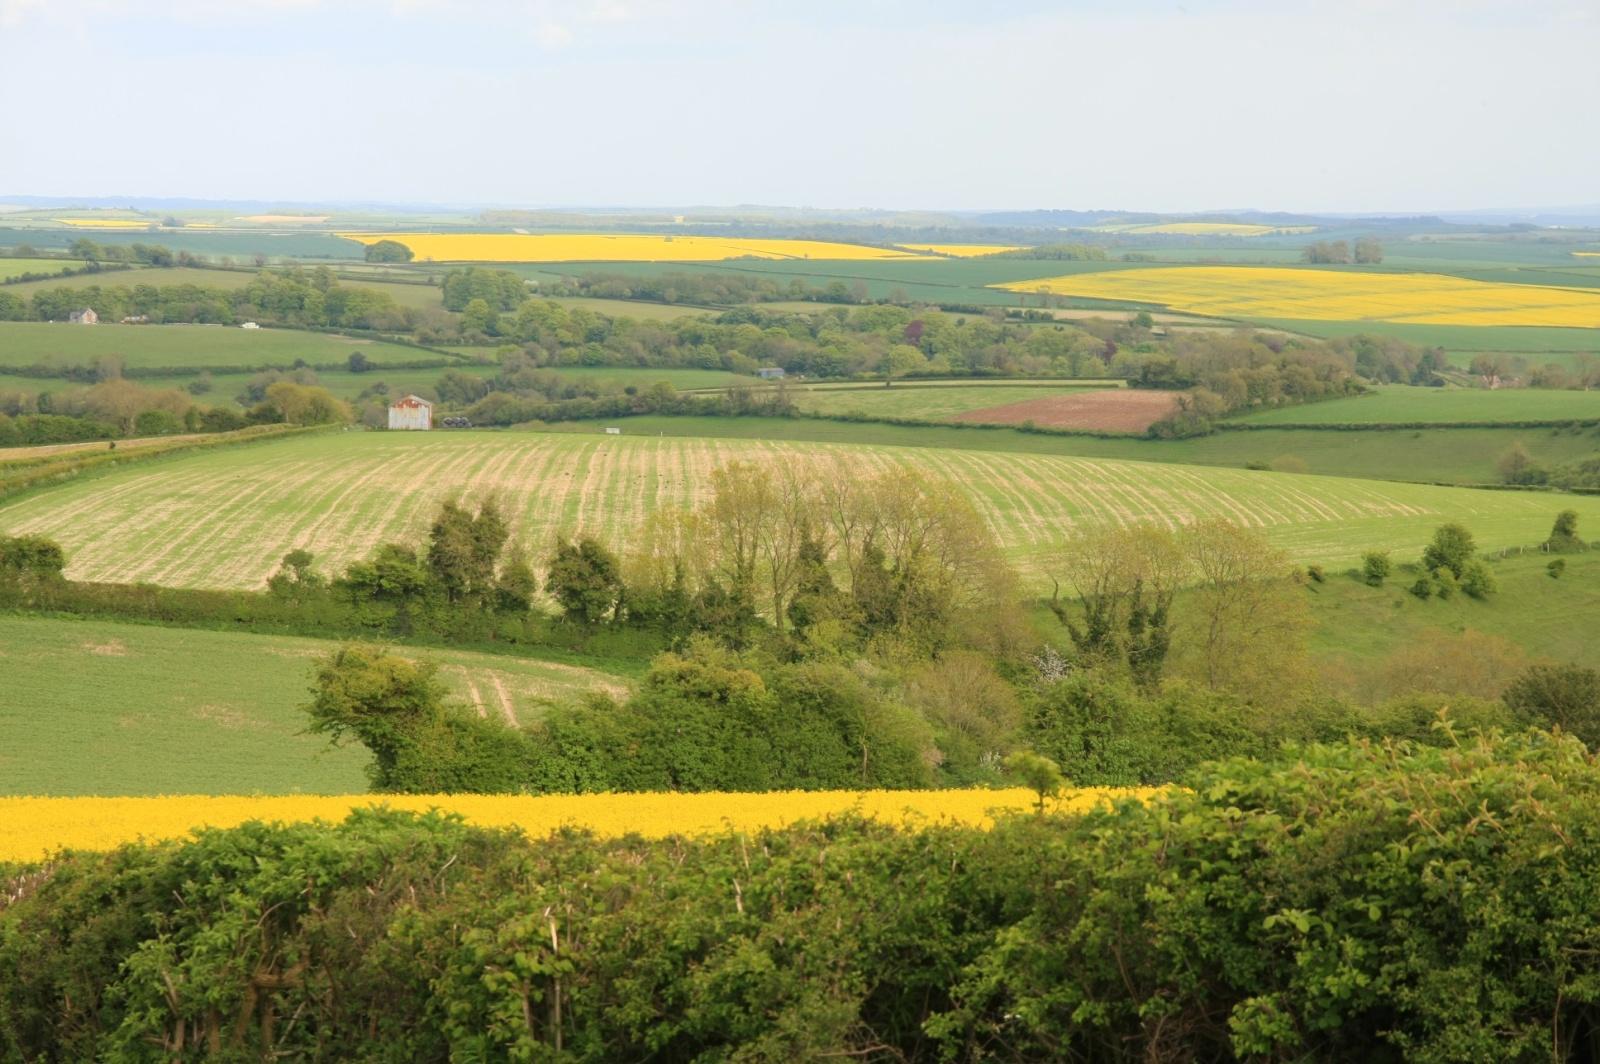 Random countryside